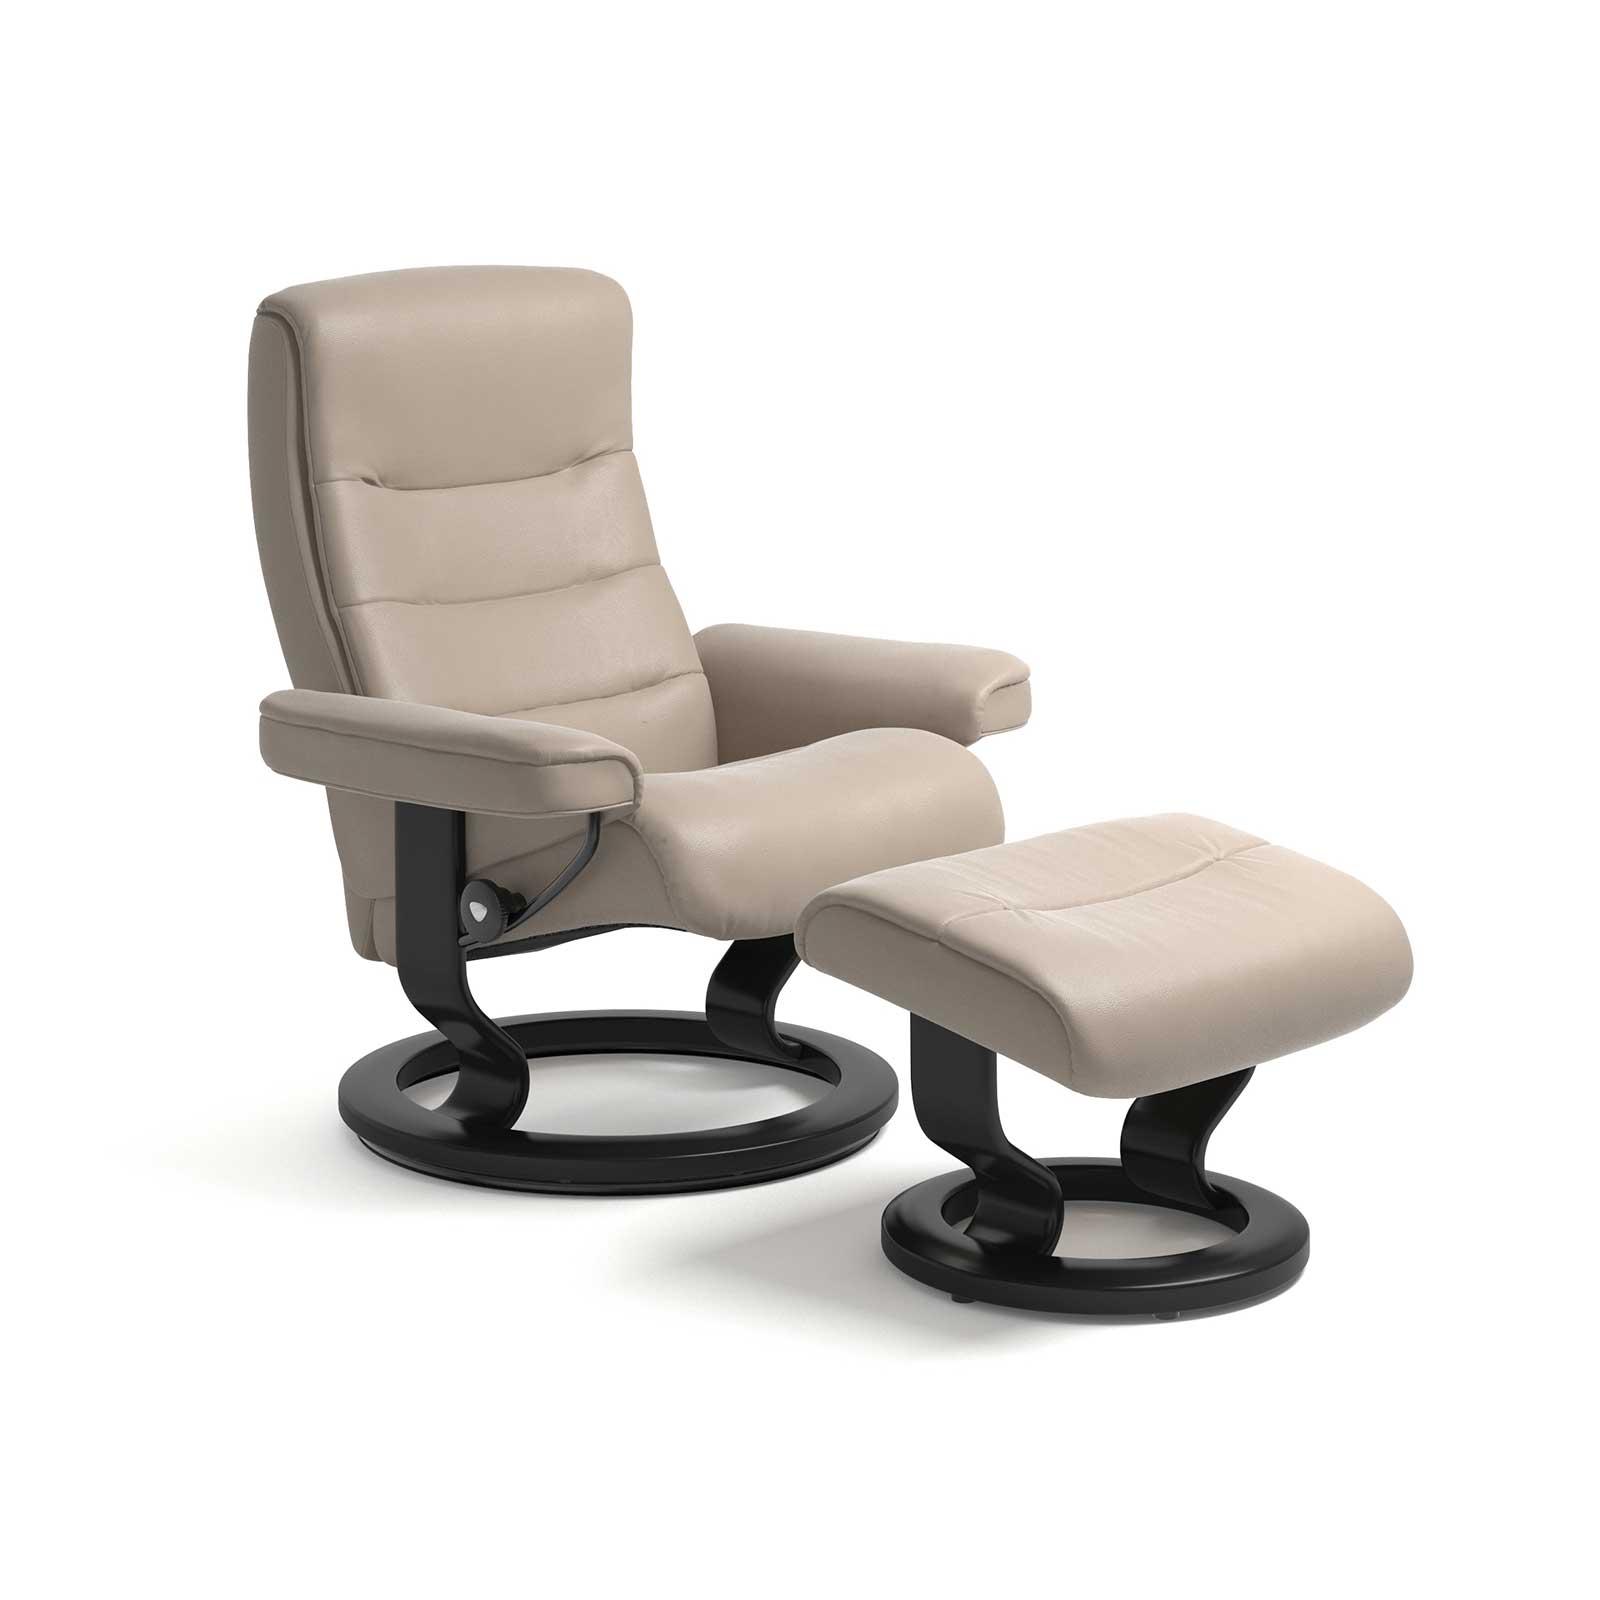 stressless sessel nordic cori beige mit hocker stressless. Black Bedroom Furniture Sets. Home Design Ideas